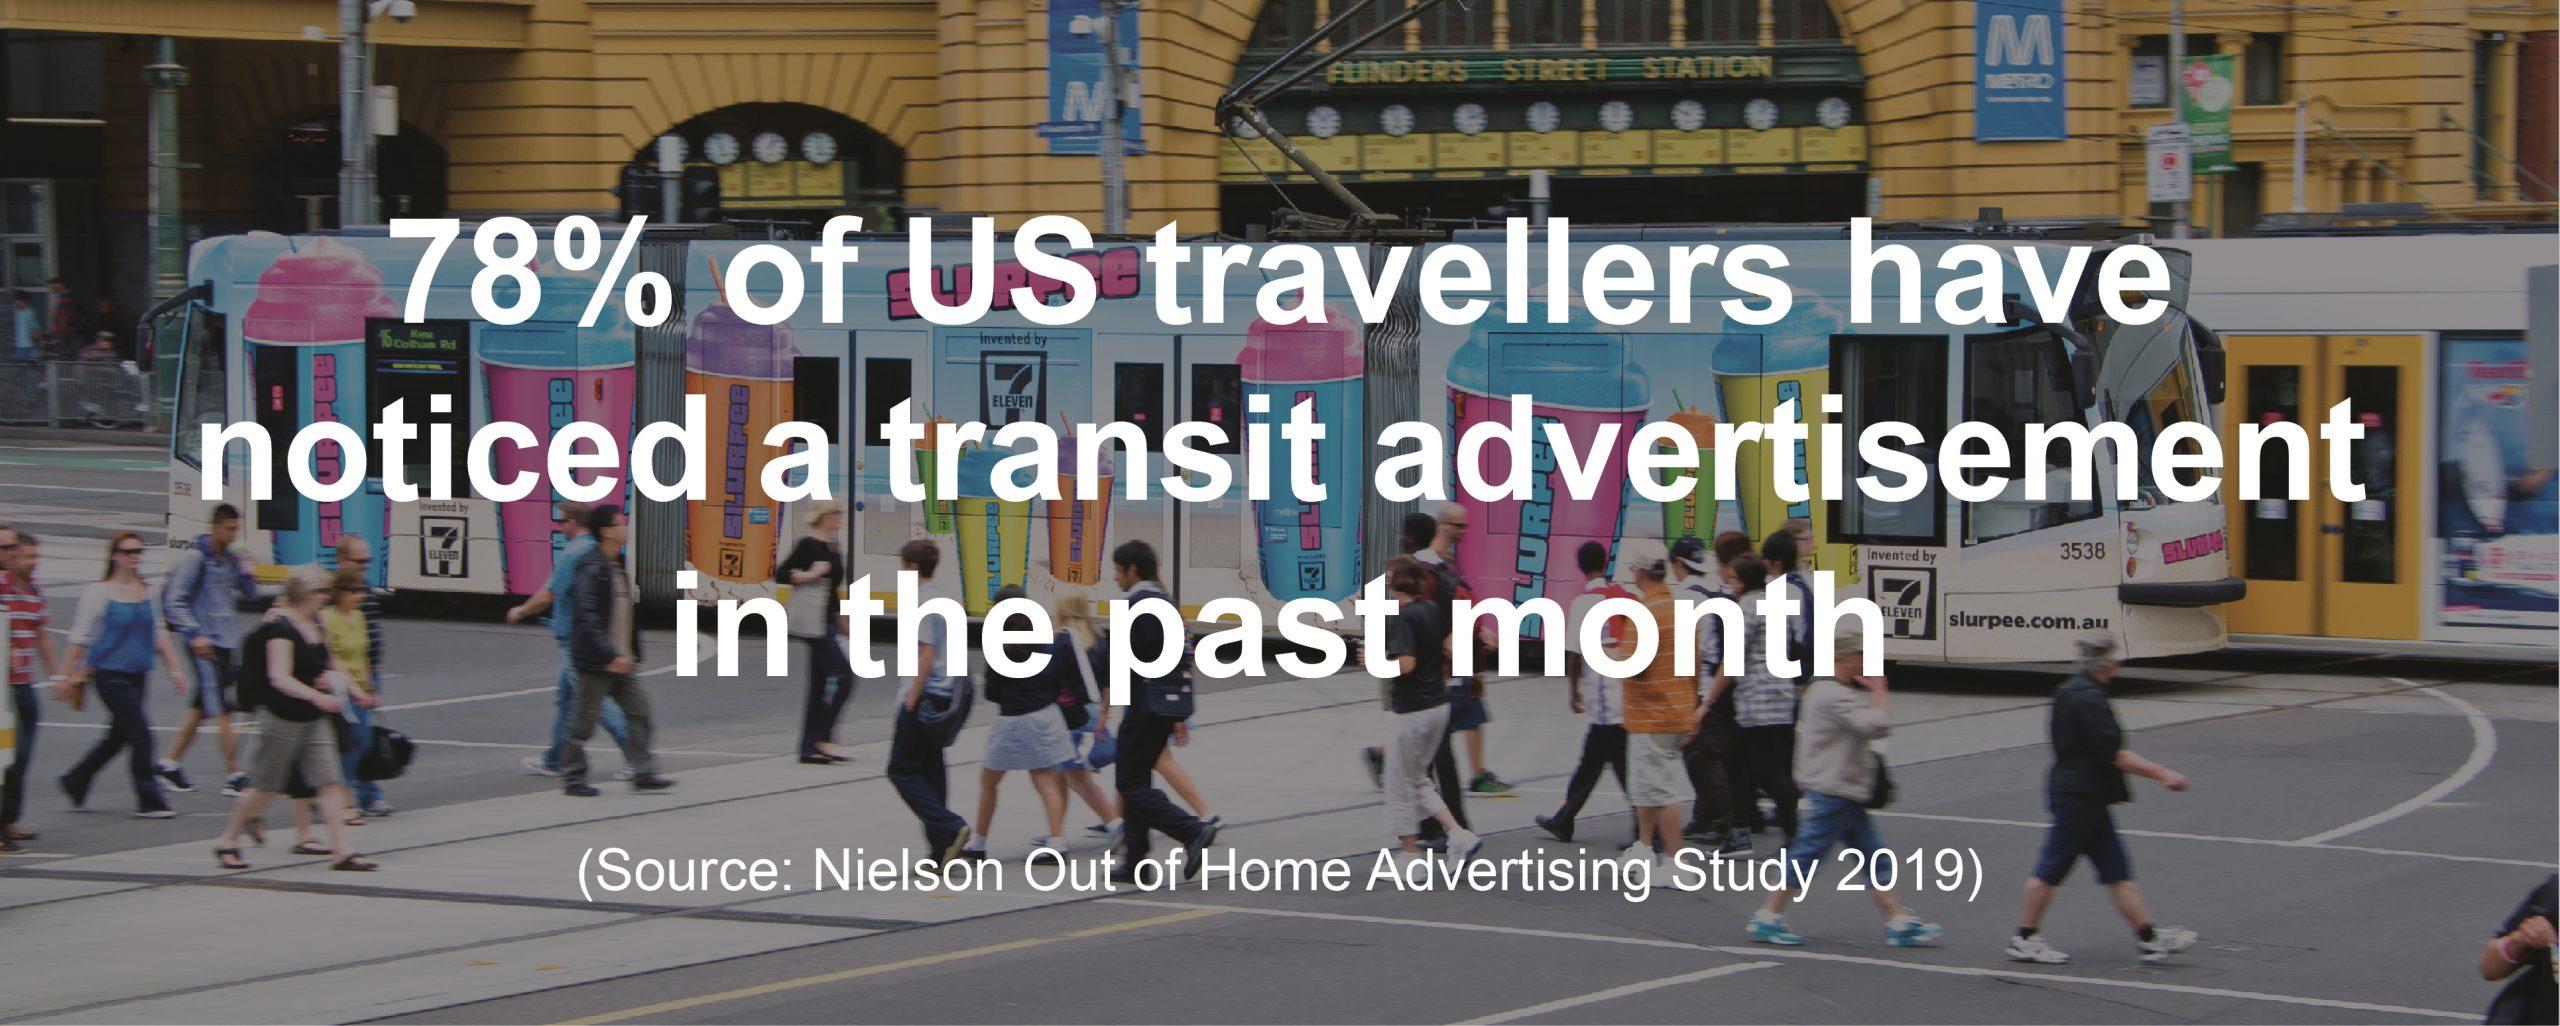 BUS TRAVELLER STATS